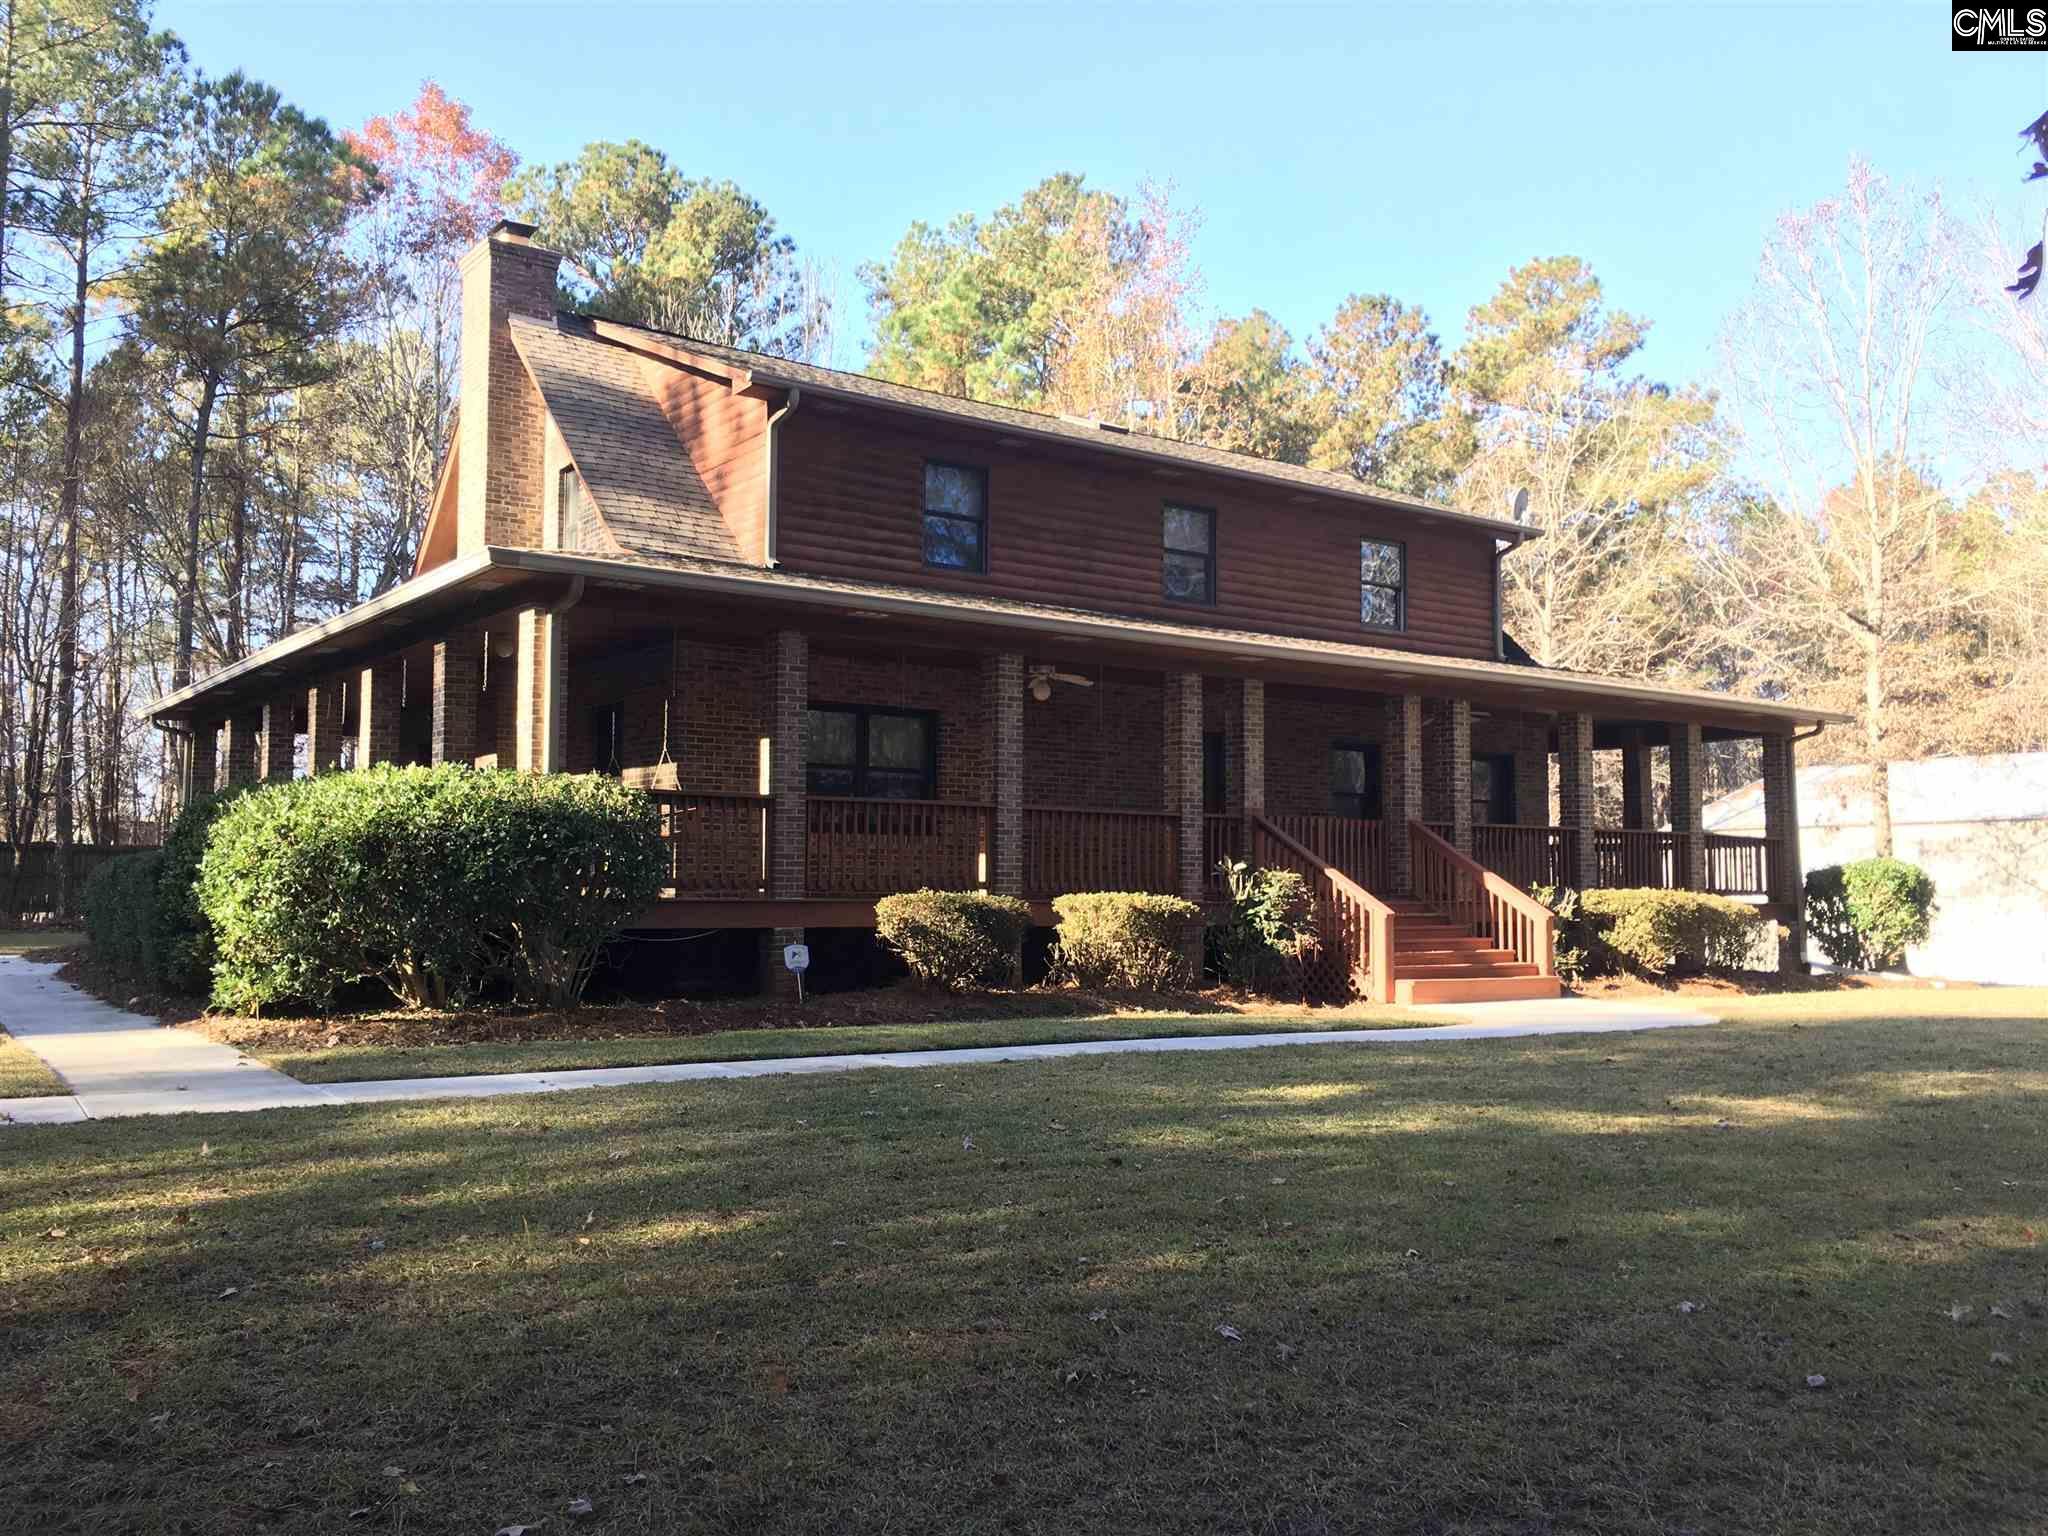 105 Bear Creek Blythewood, SC 29016-8319